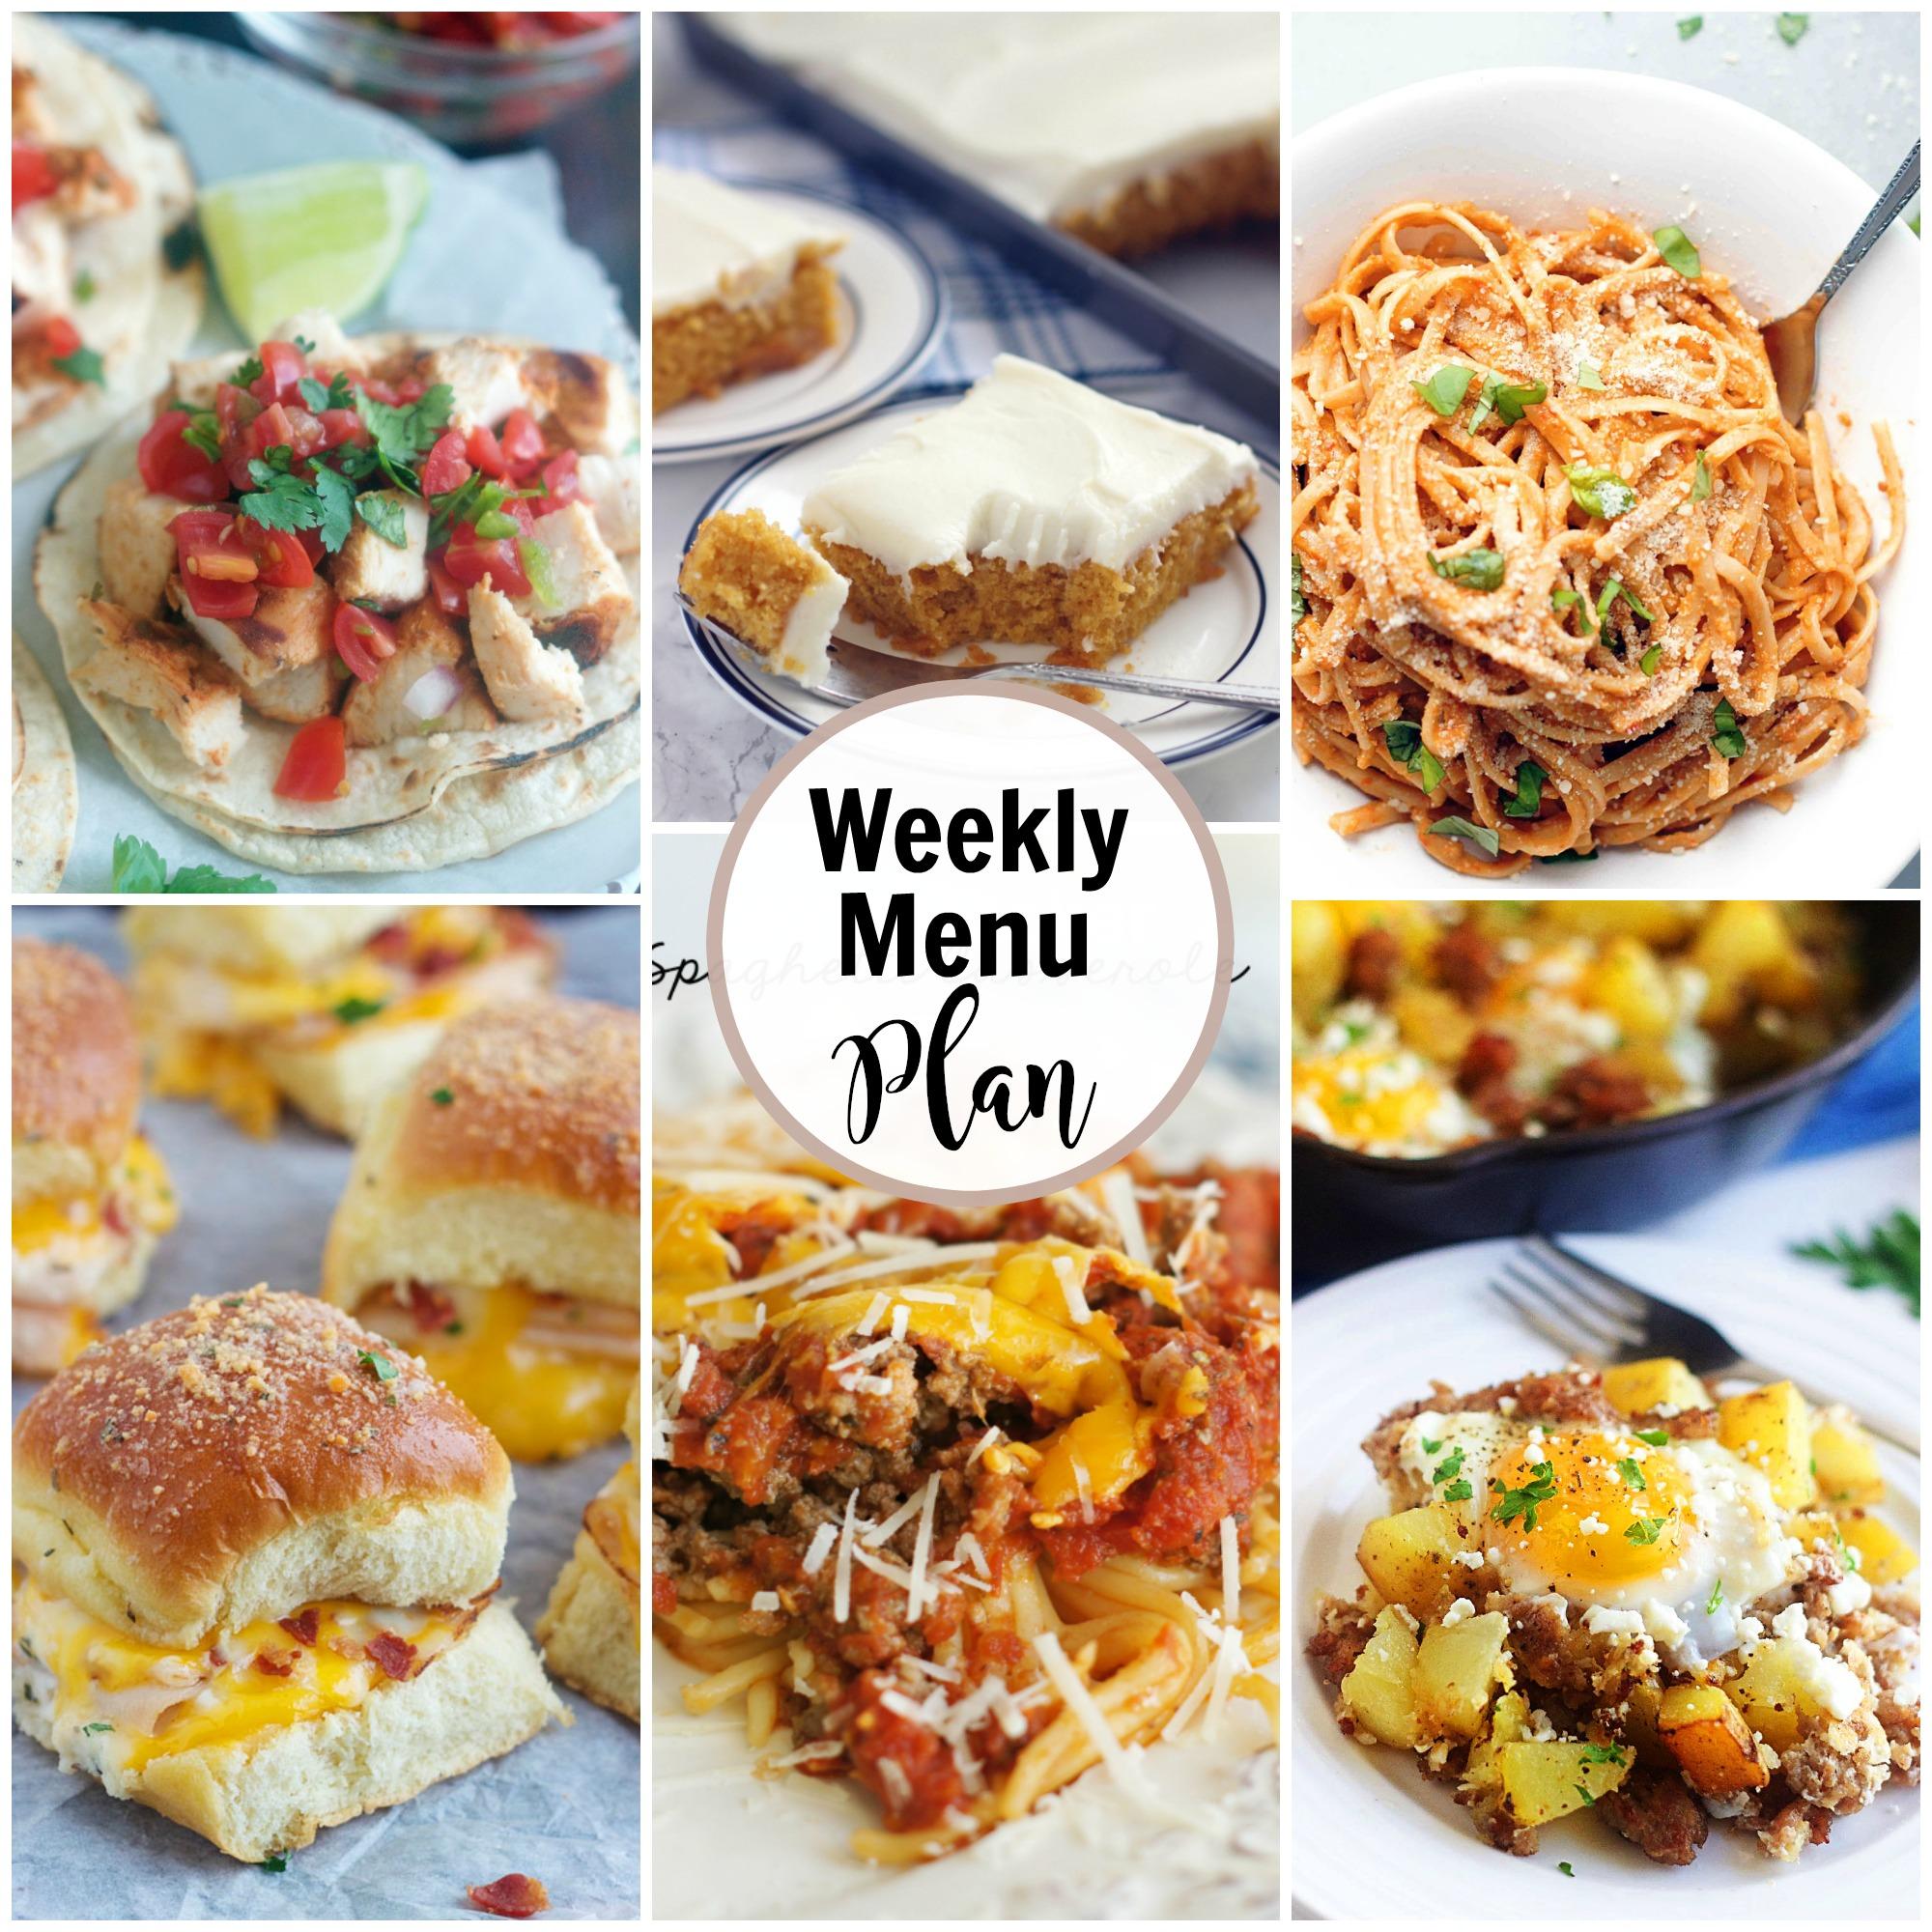 weekly menu plan collage